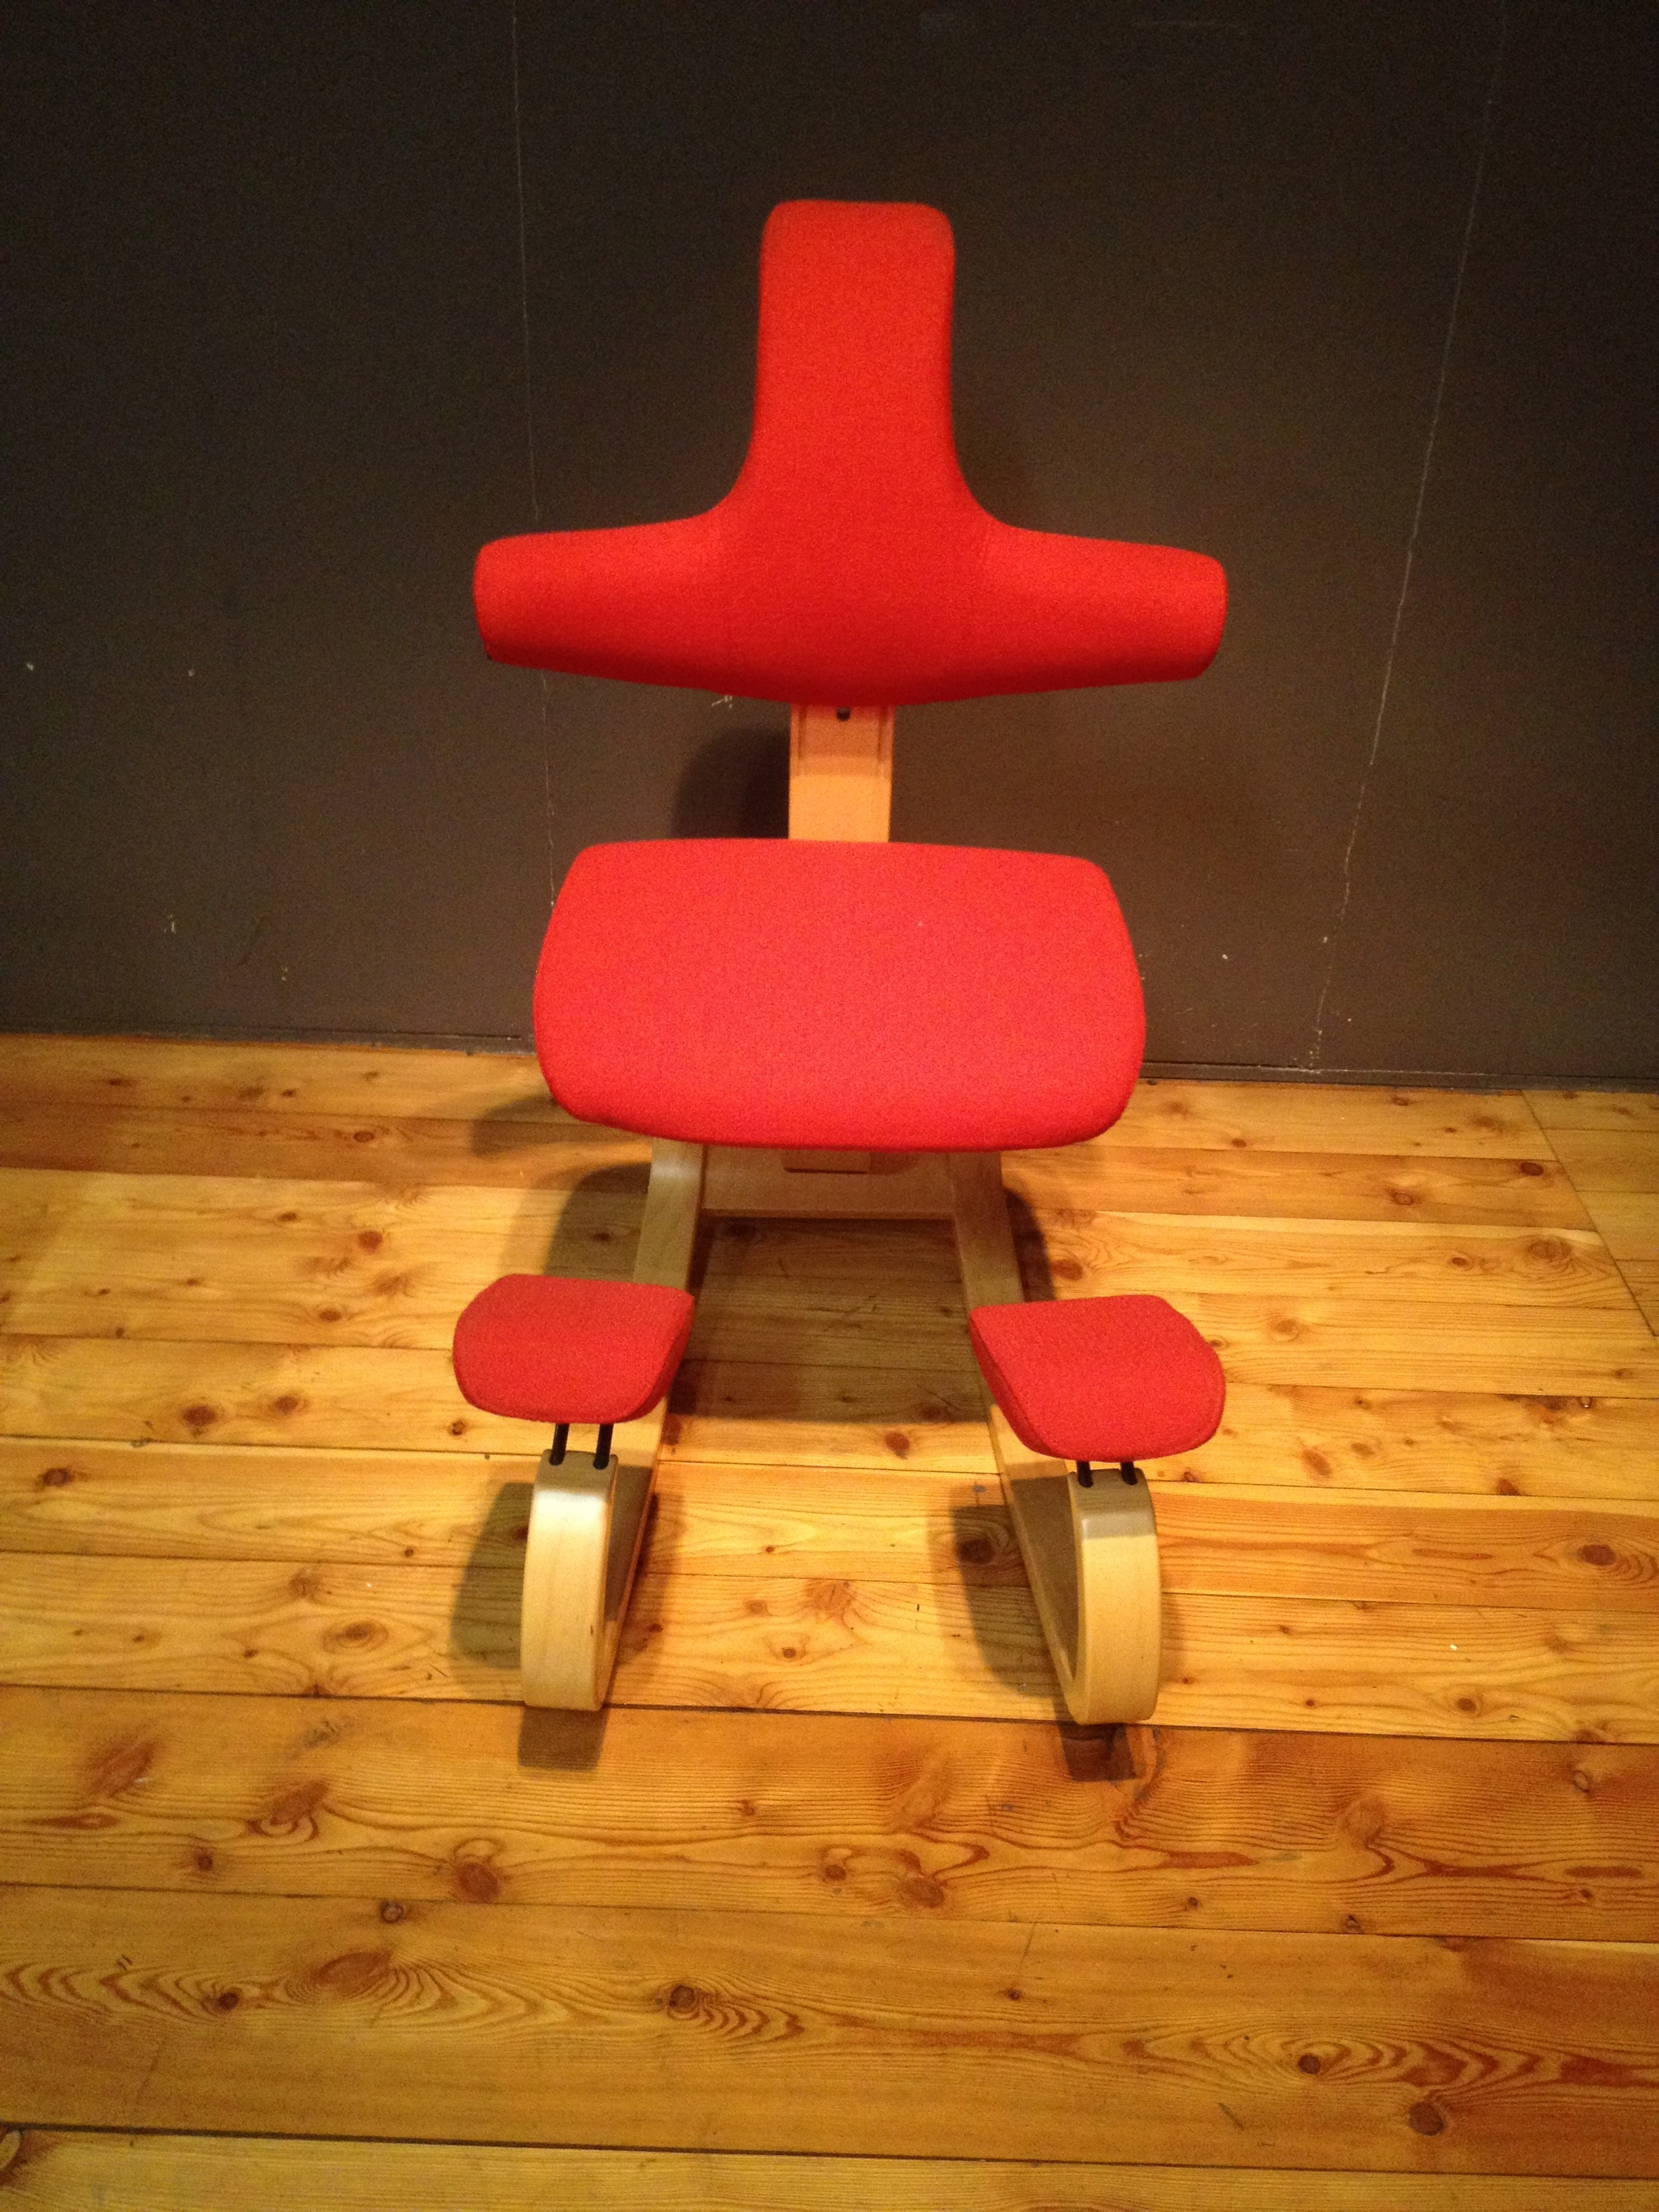 Thatsit Balance rossa - Sedie a prezzi scontati